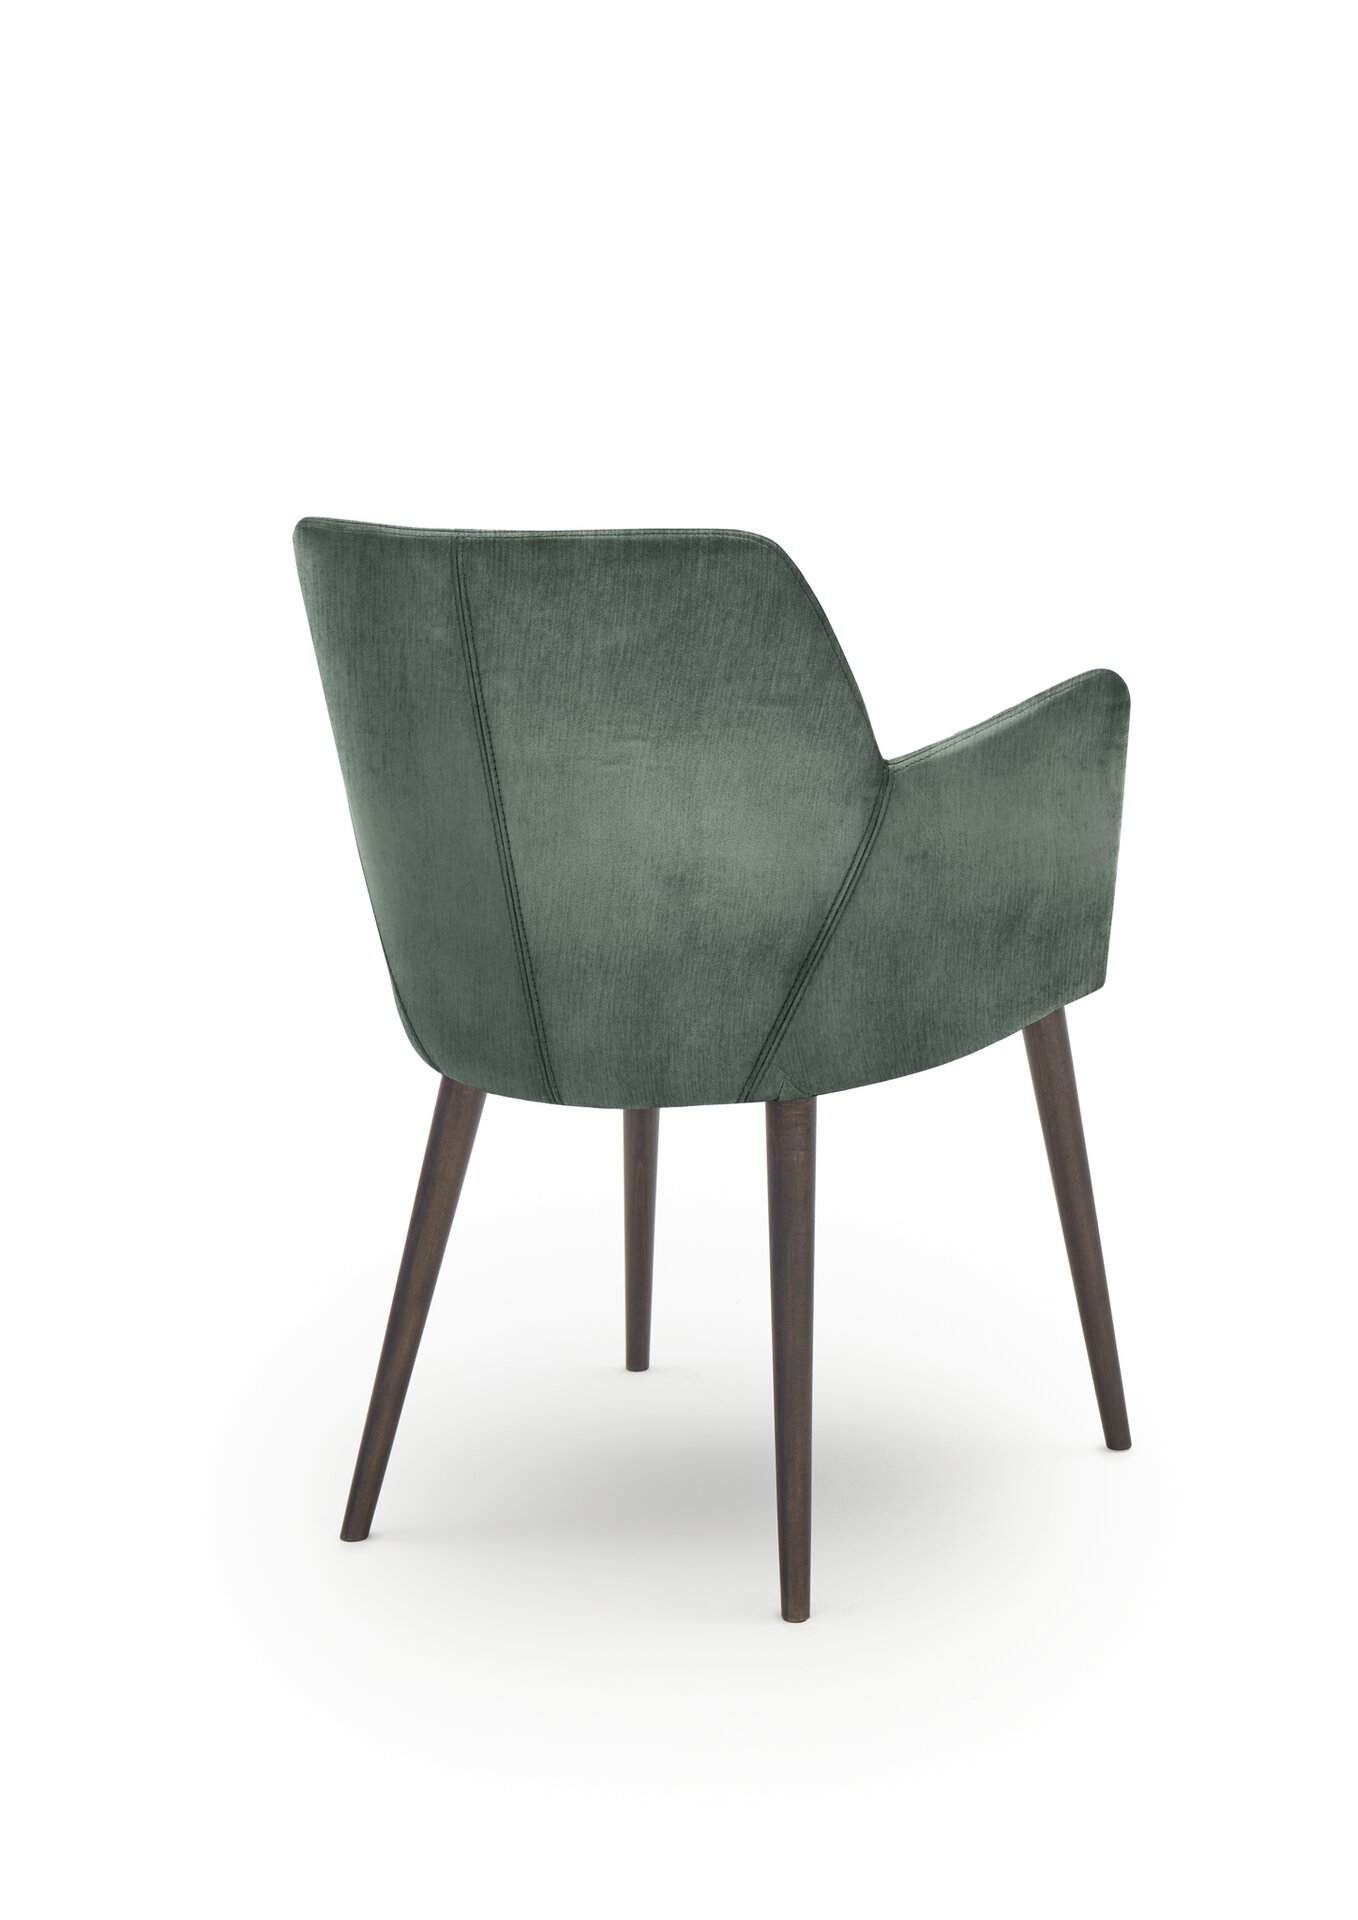 4-Fuß-Stuhl WK7005 Stuart WK Wohnen Edition Textil grün 57 x 83 x 59 cm